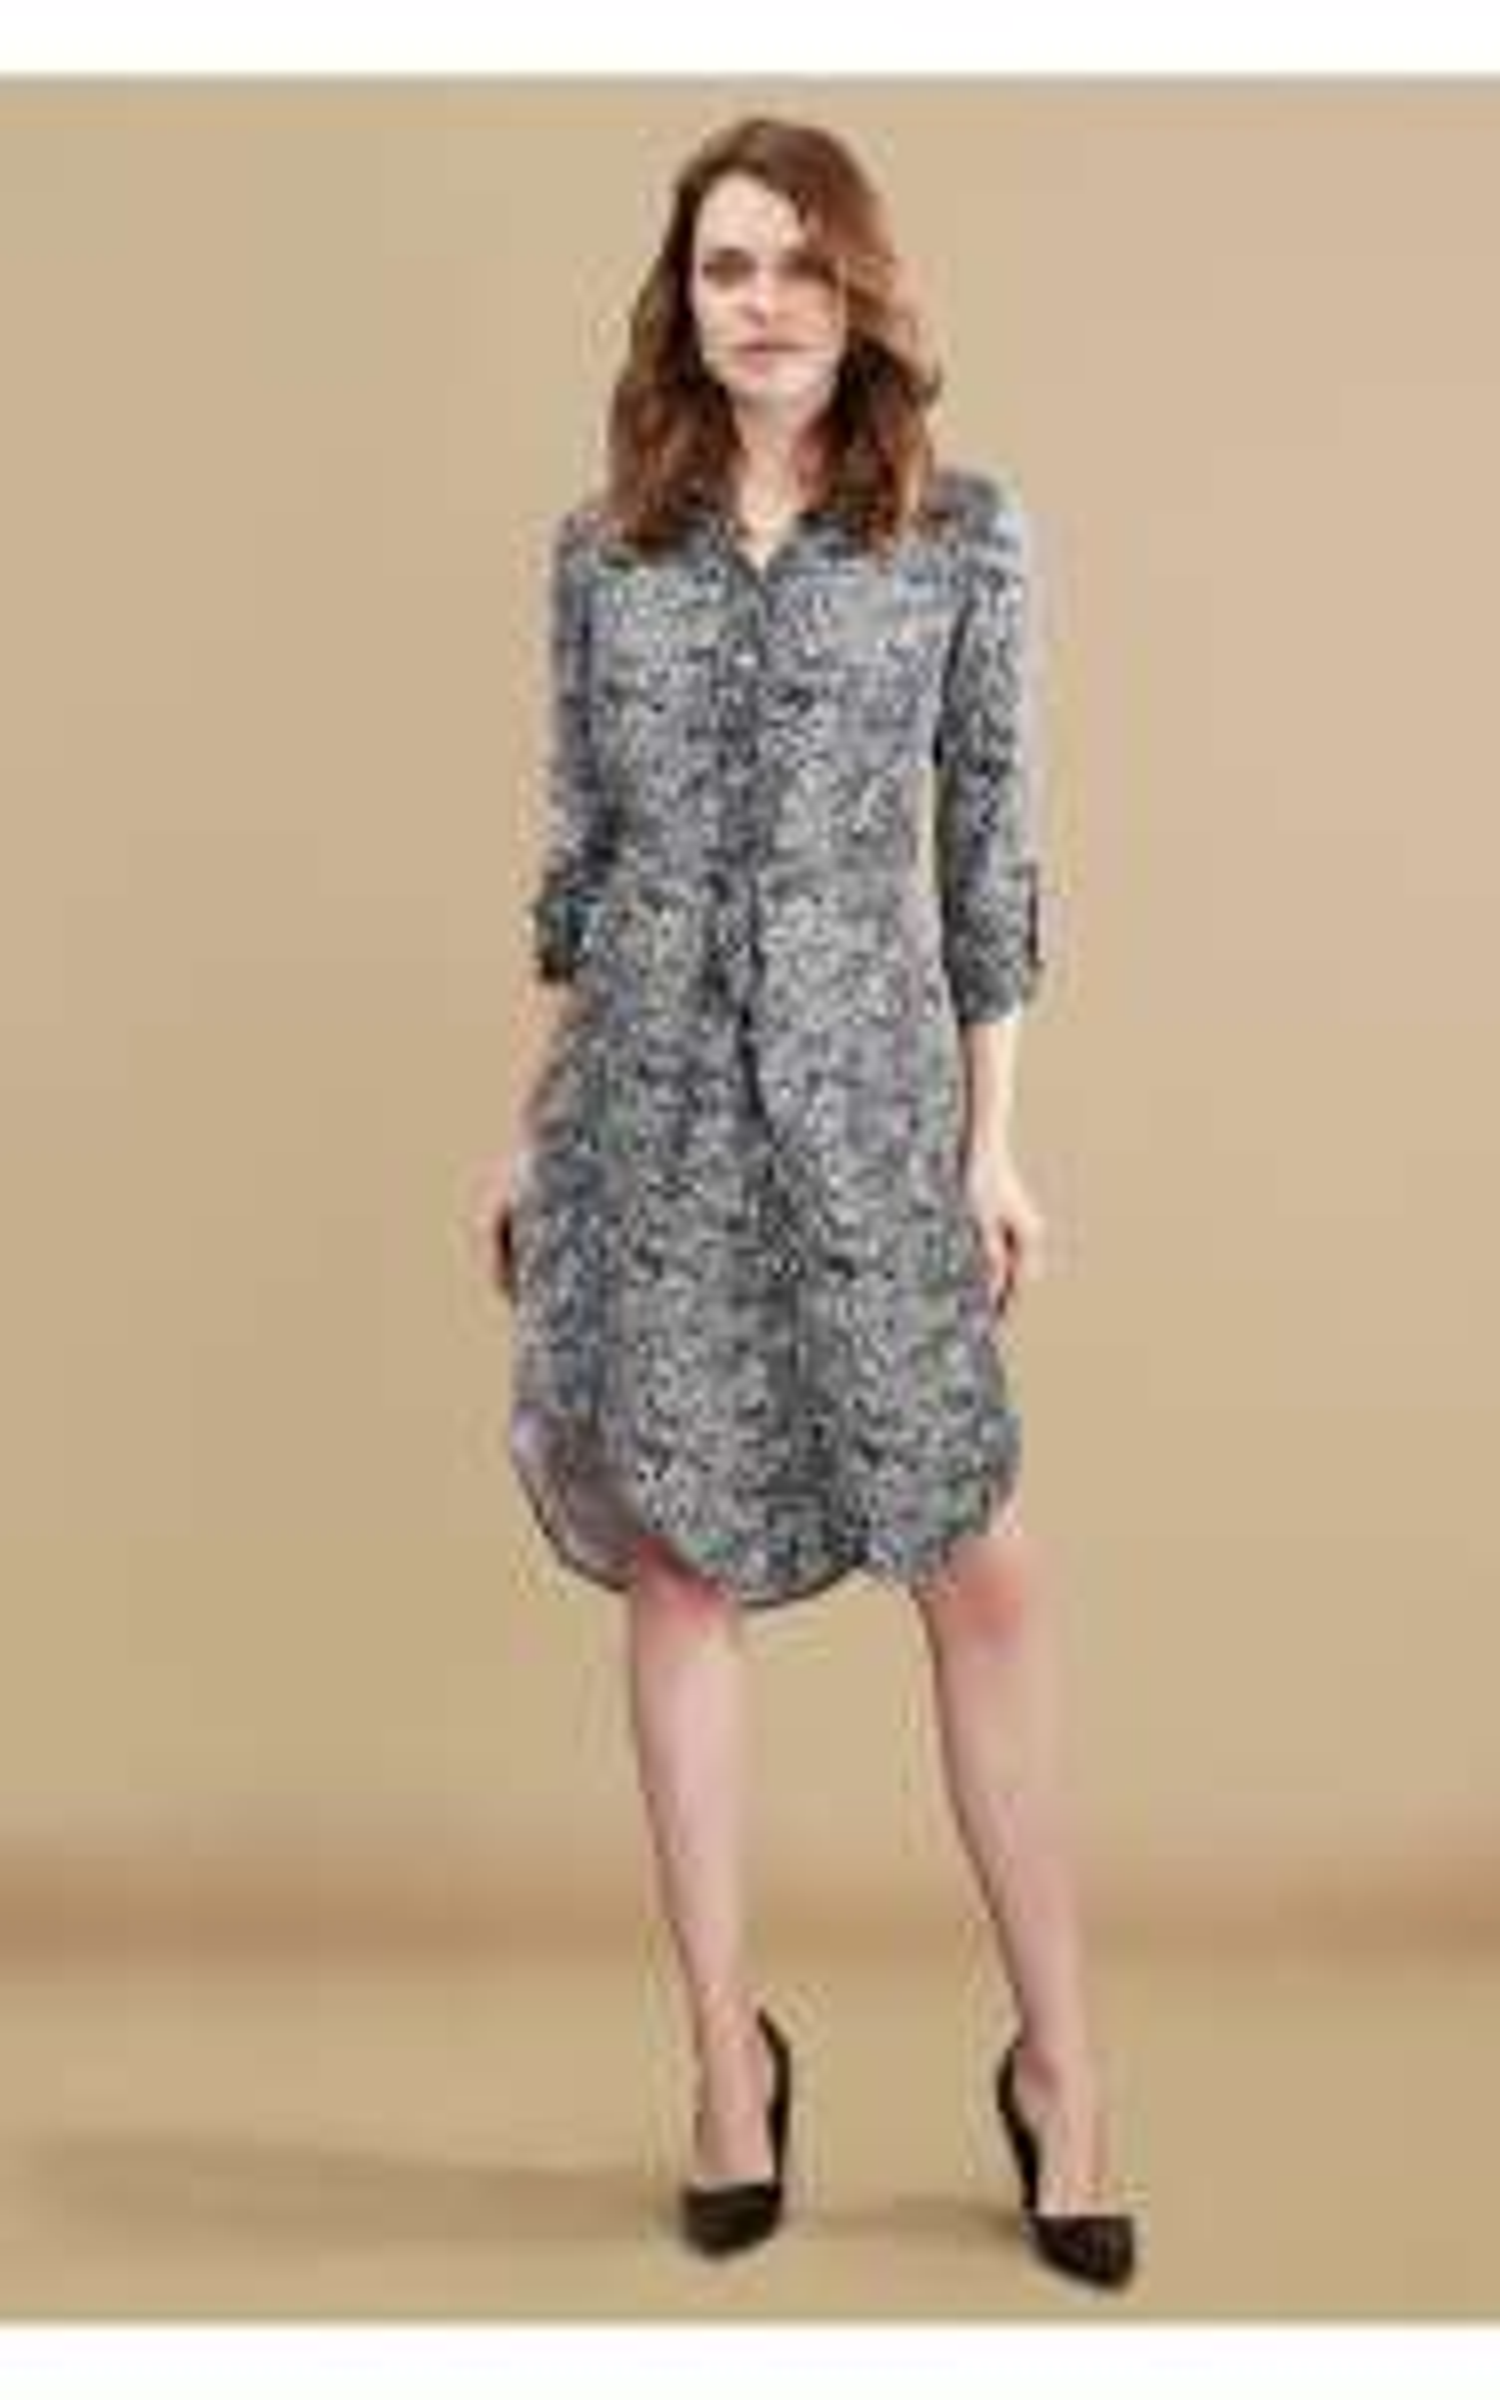 GREY SNAKE PRINT SHIRT DRESS £12.99 + 99p C&C @ Select Fashion